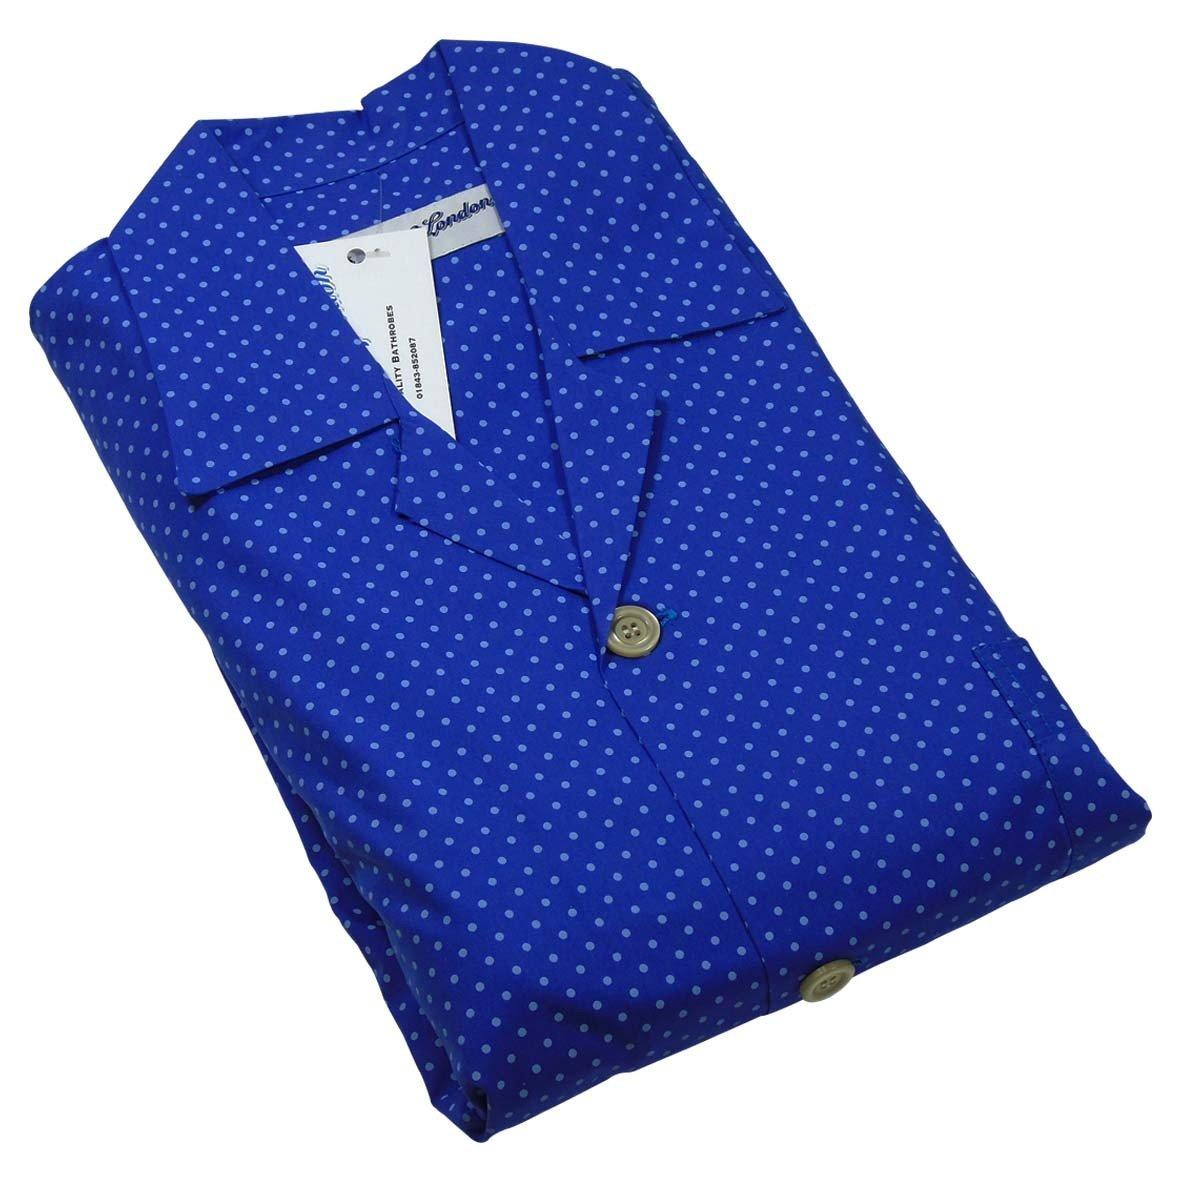 Men's Chelsea Blue Spot Pajamas Set, Fine Brushed Cotton Top & Trousers, Royal Blue Medium by Bown of London (Image #1)